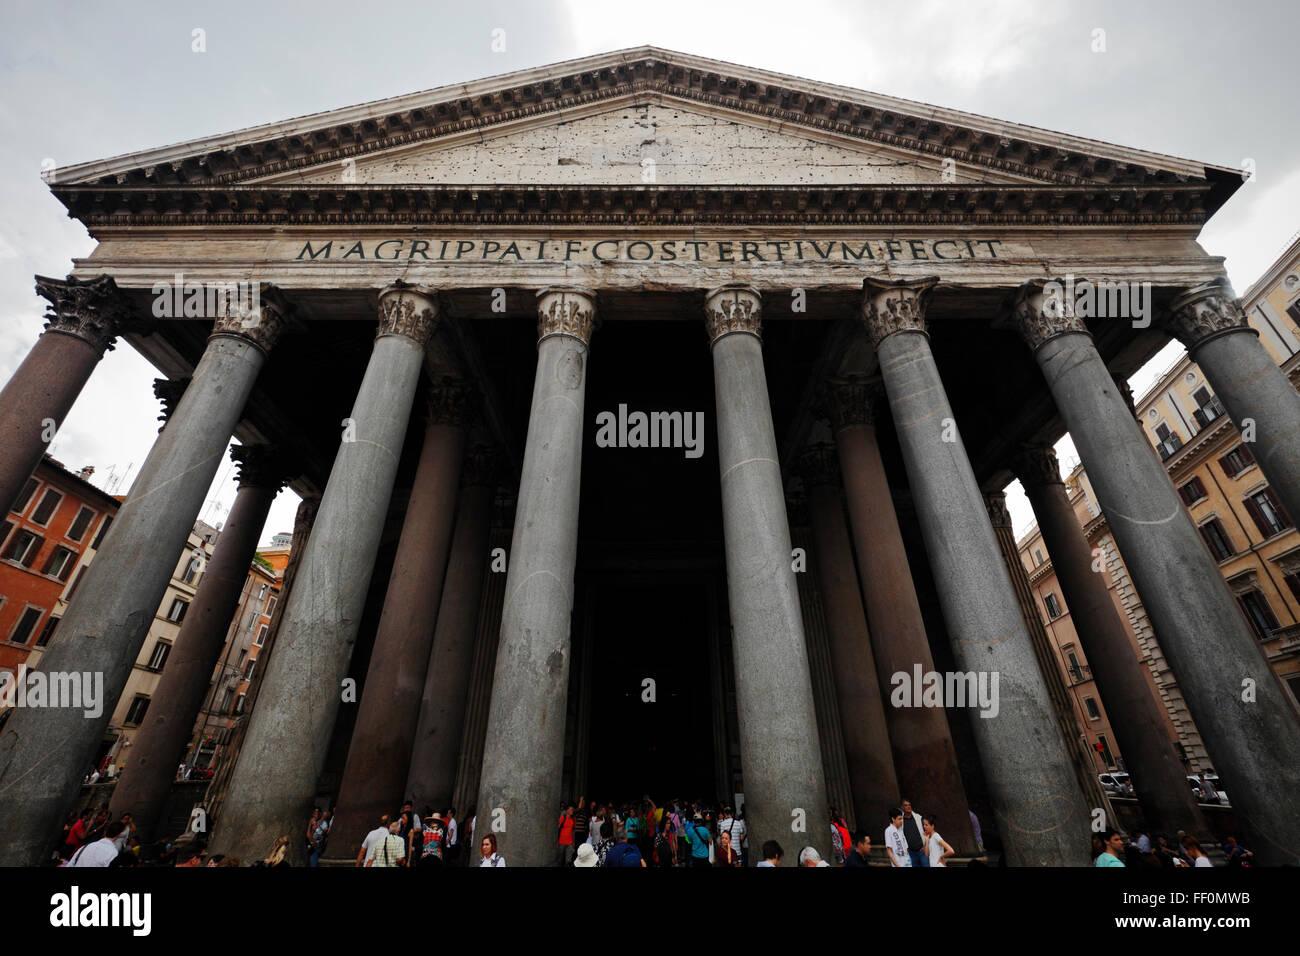 The Pantheon on Piazza della Rotonda, Rome, Italy Stock Photo